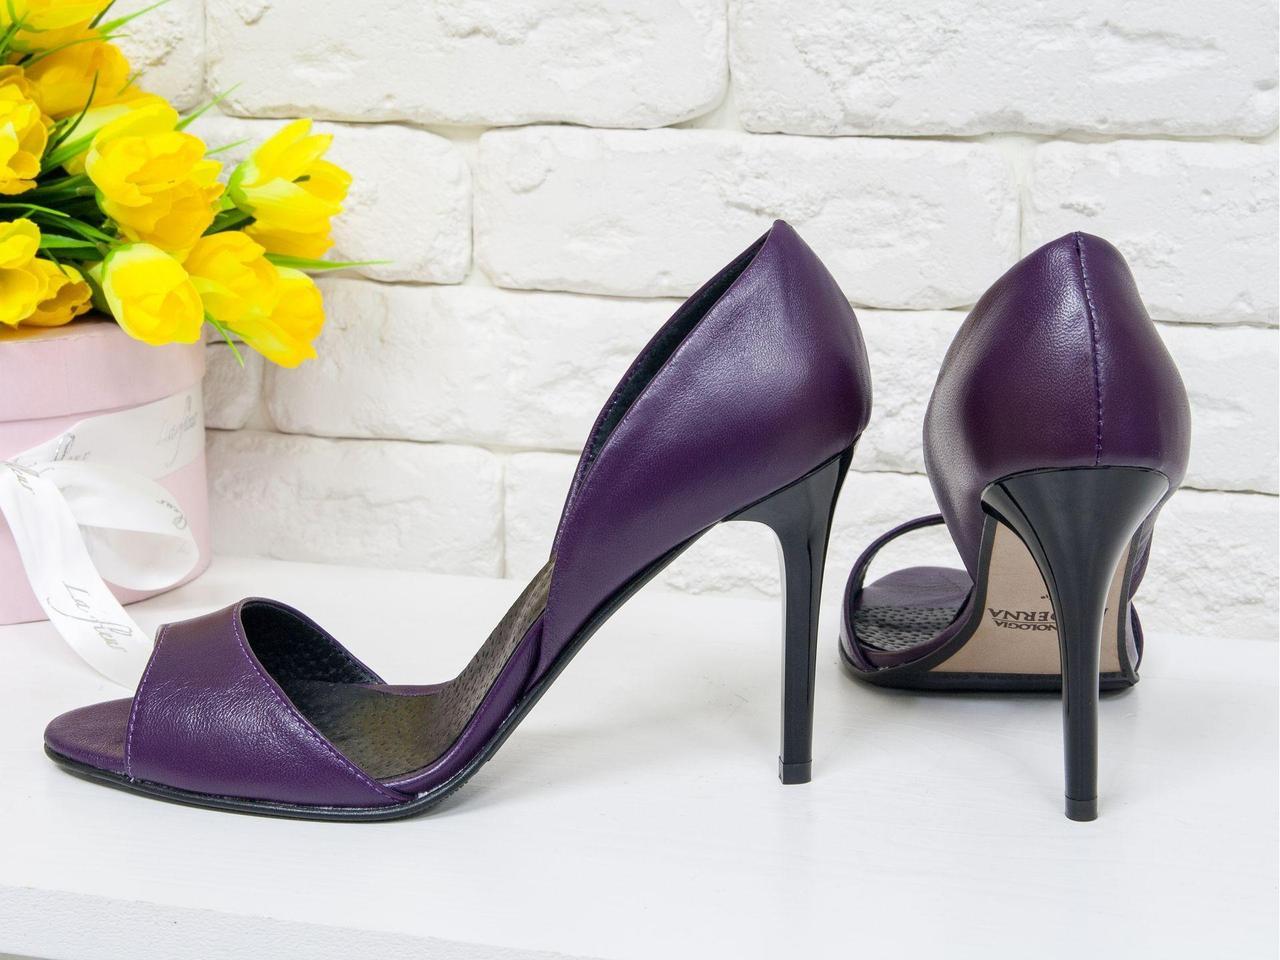 VM-Villomi Демисезонные сапоги цвета бордо